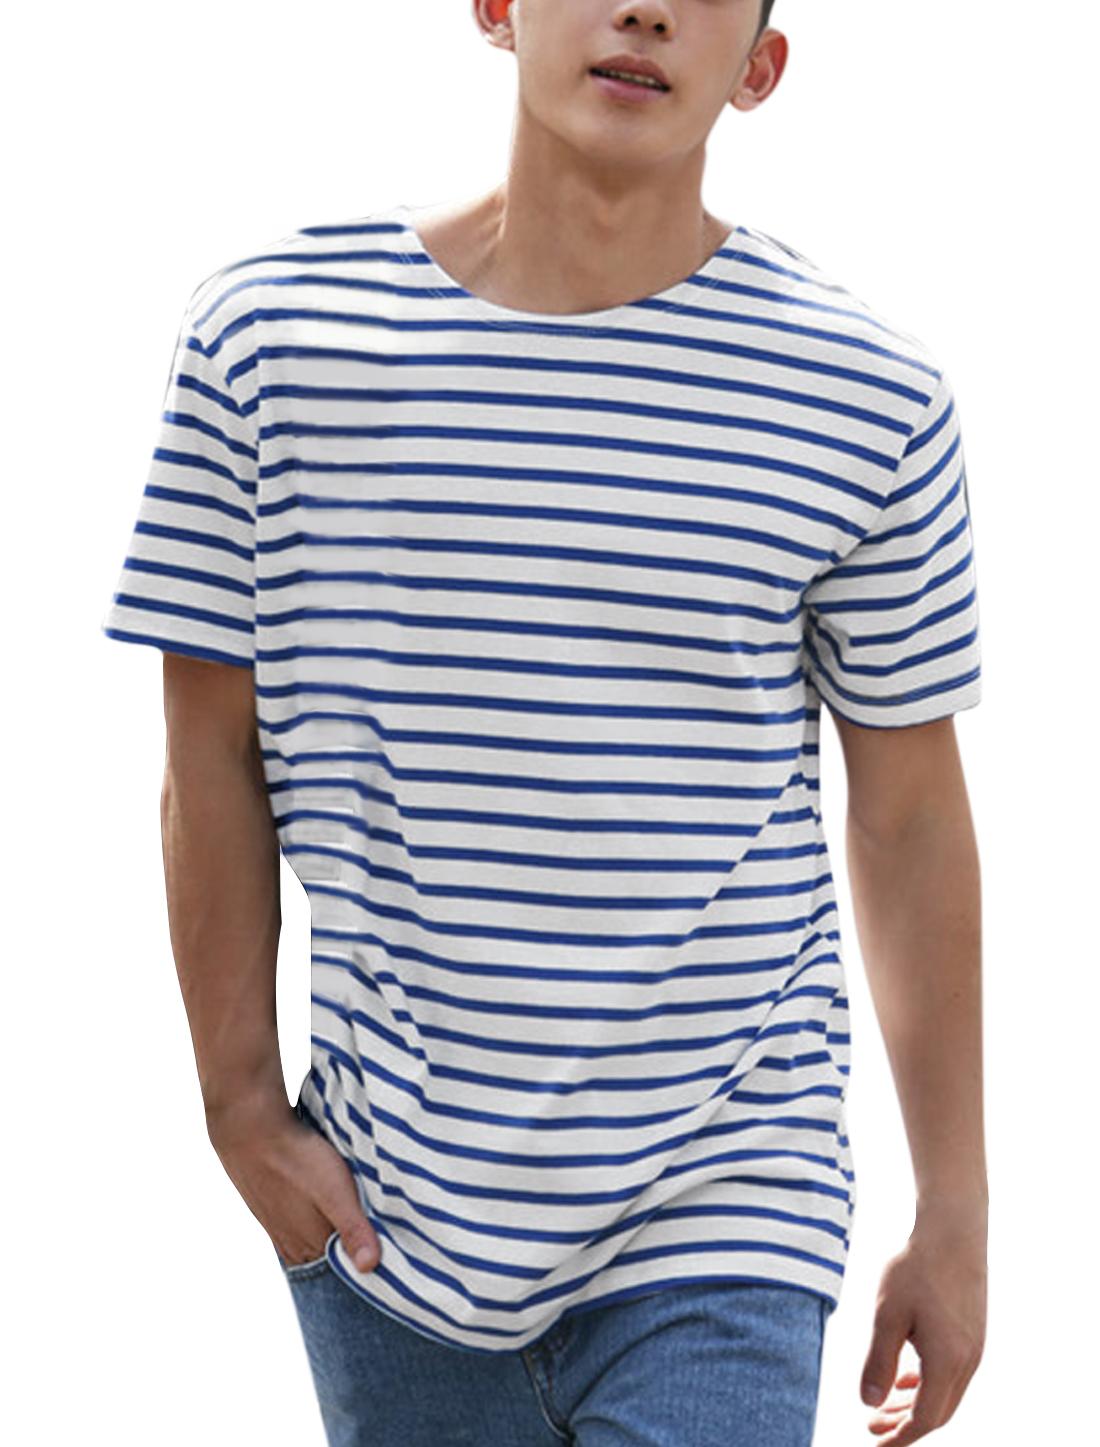 Men Short Sleeves Striped Tee Shirts Blue White S